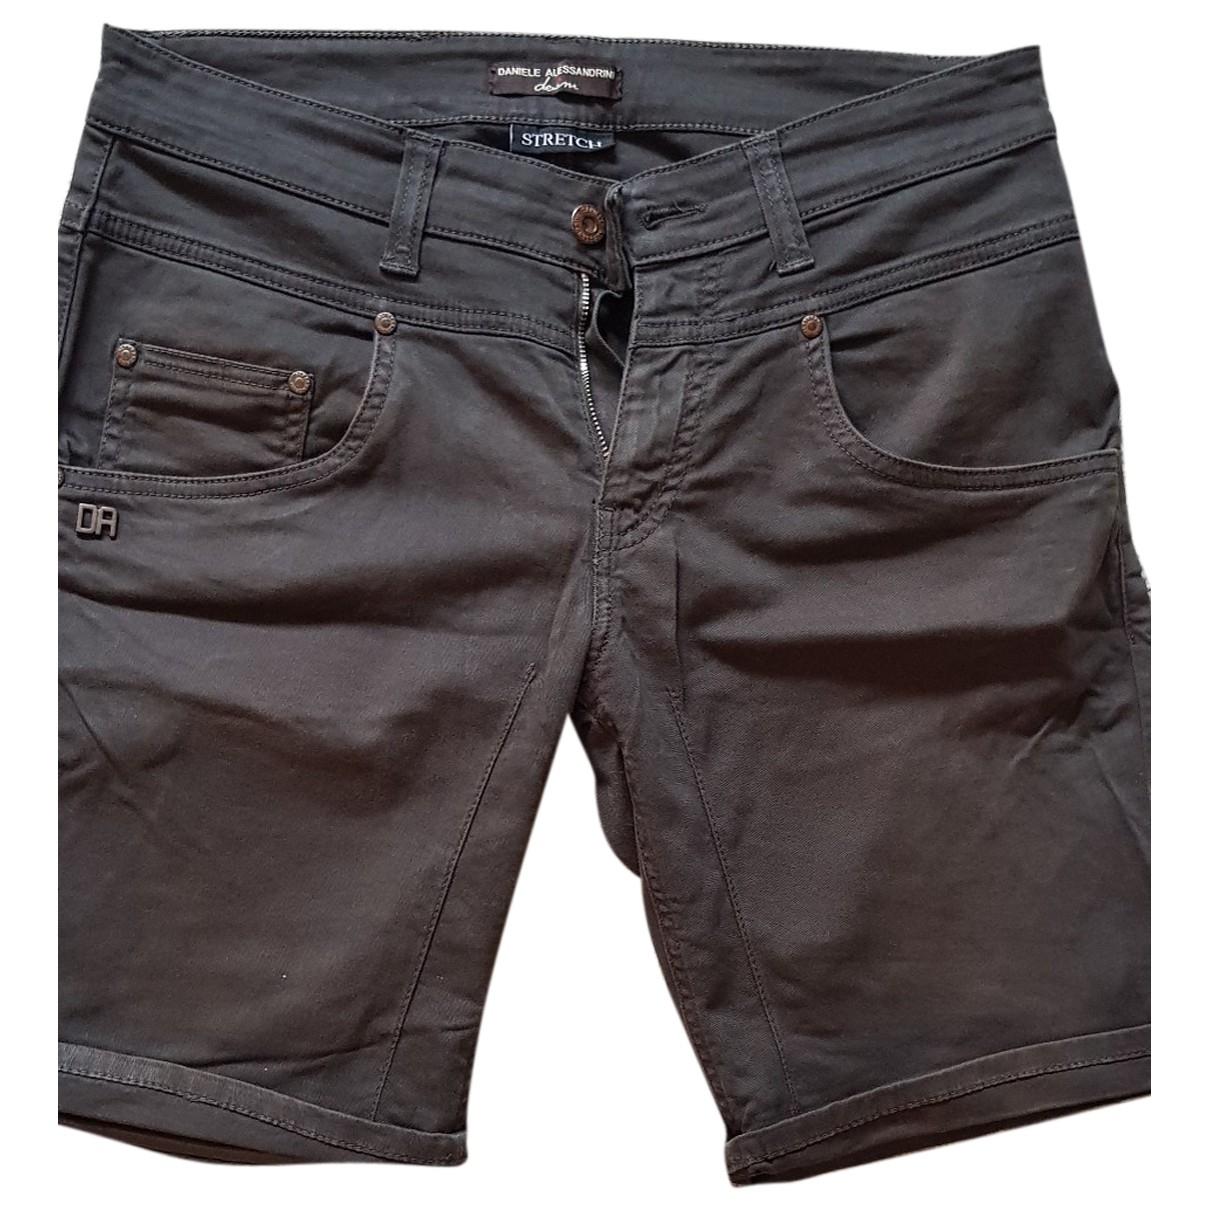 Daniele Alessandrini \N Black Cotton Shorts for Men 30 UK - US